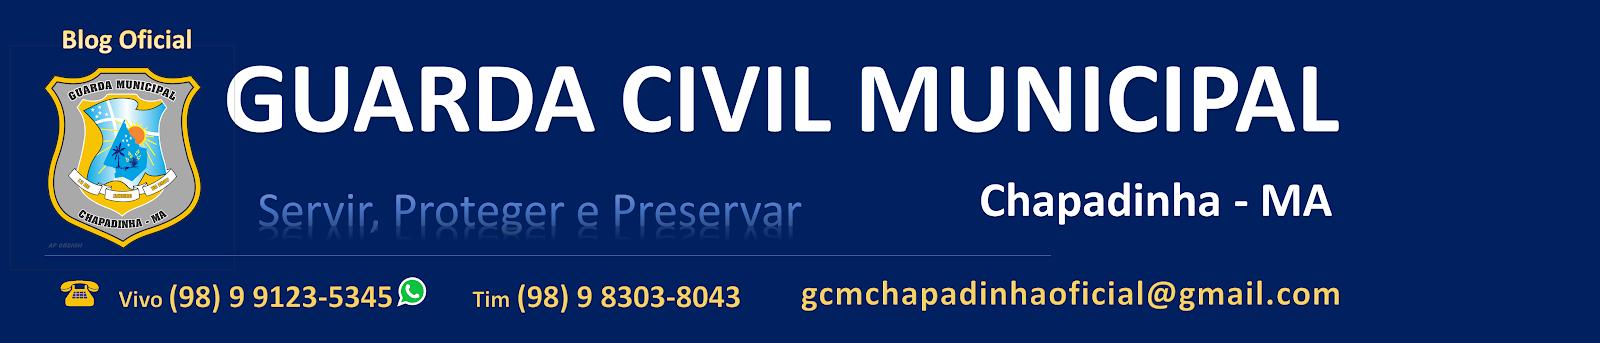 Guarda Civil Municipal de Chapadinha